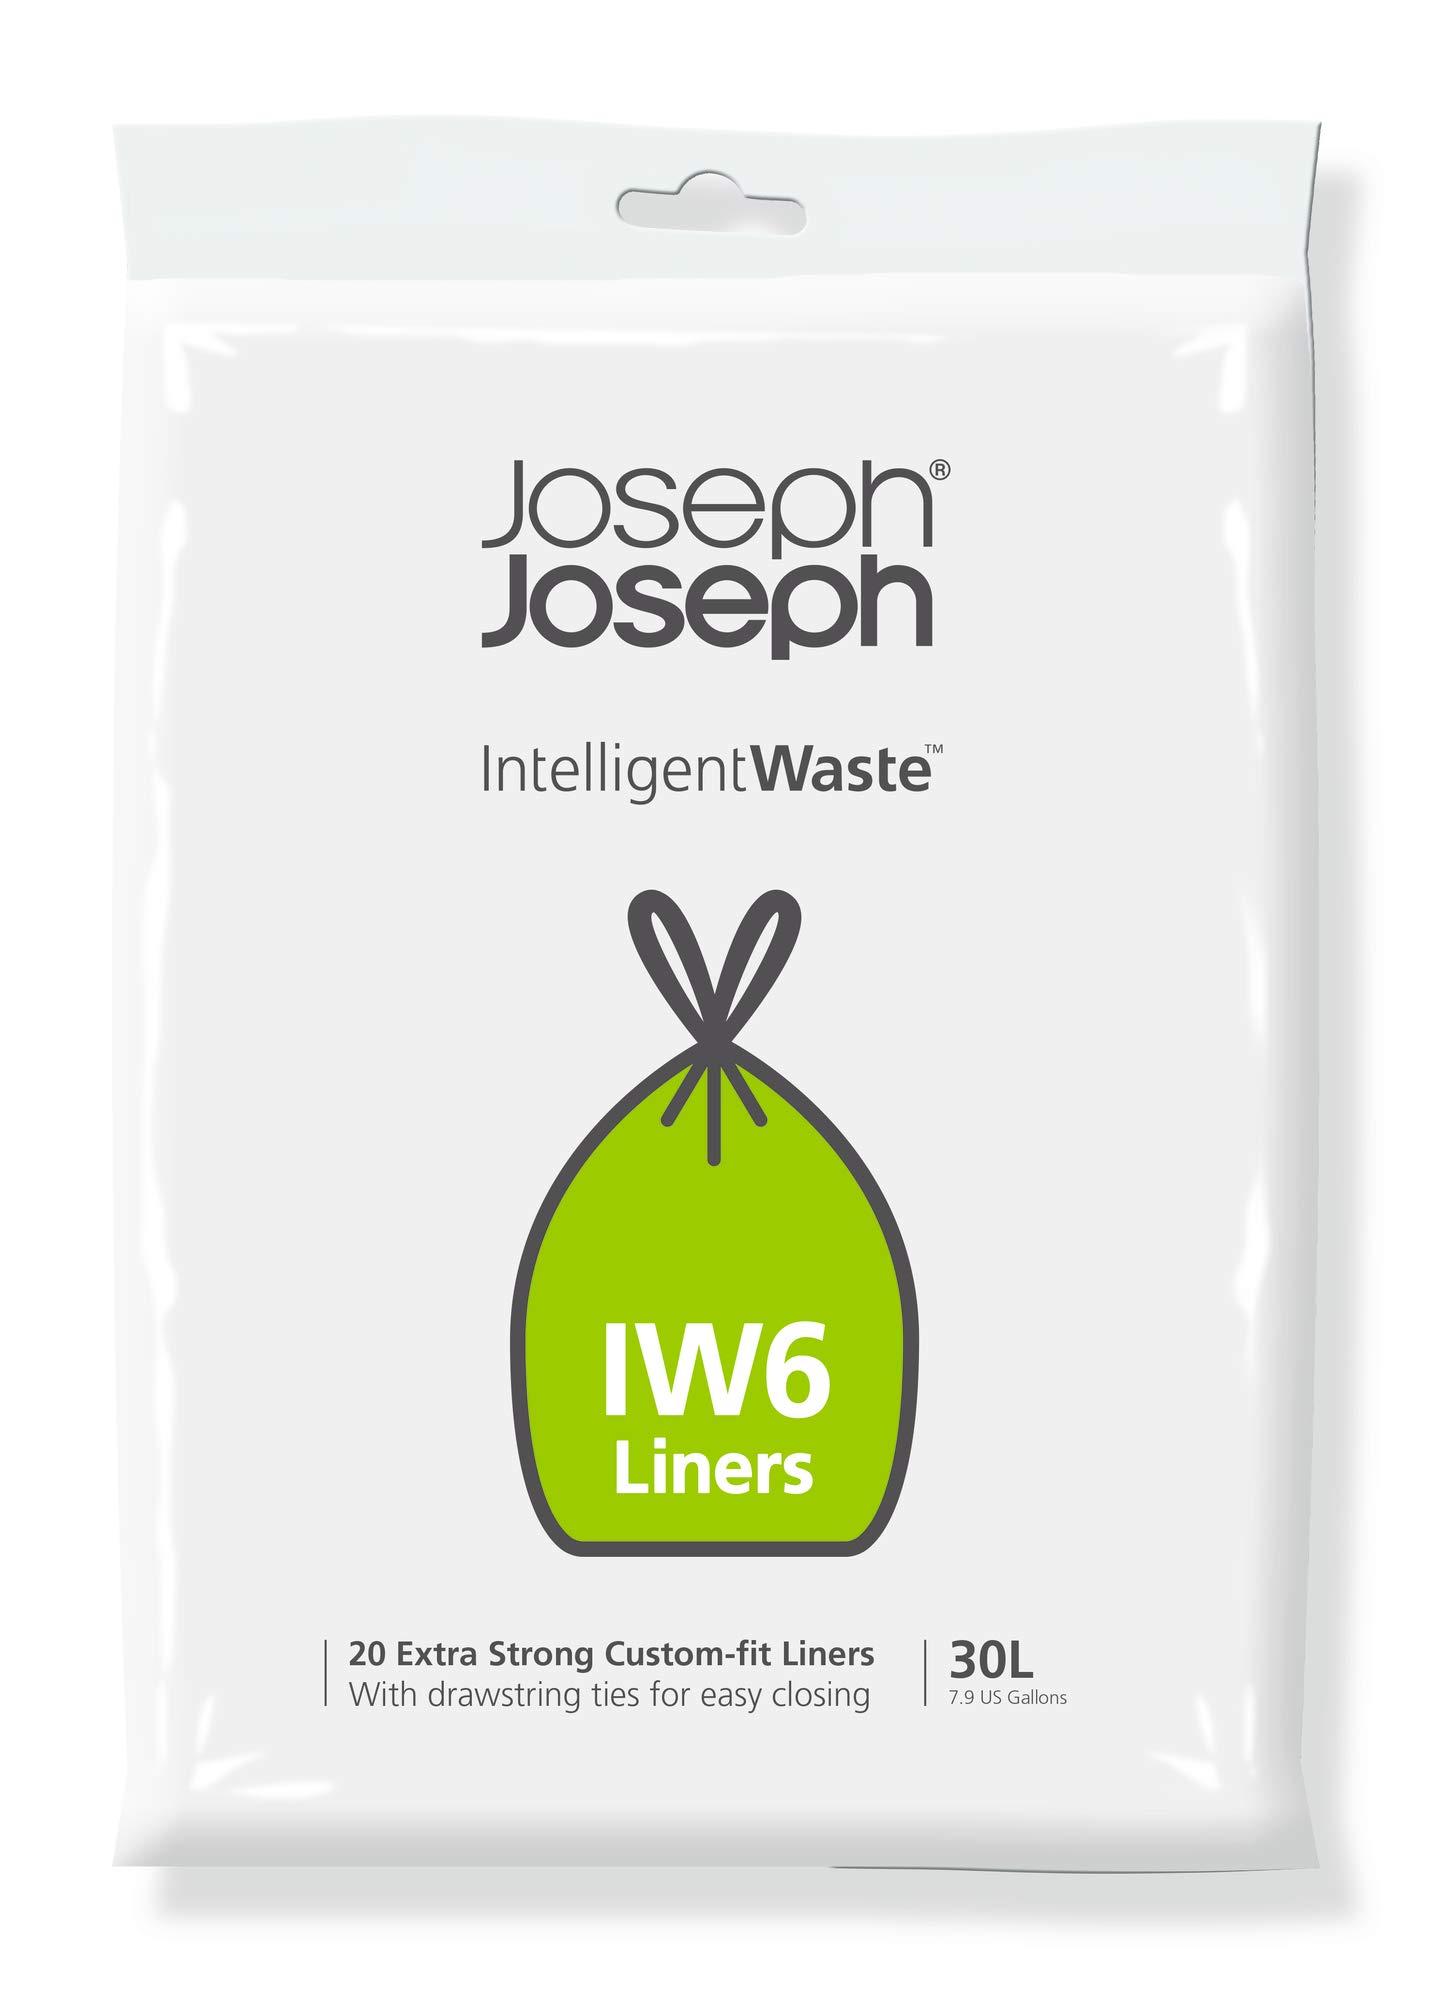 Joseph Joseph 30058 Intelligent Waste IW6 General Waste Liner Trash Bags for Totem Max 30 Liter / 8 Gallon, 20-Pack, Gray